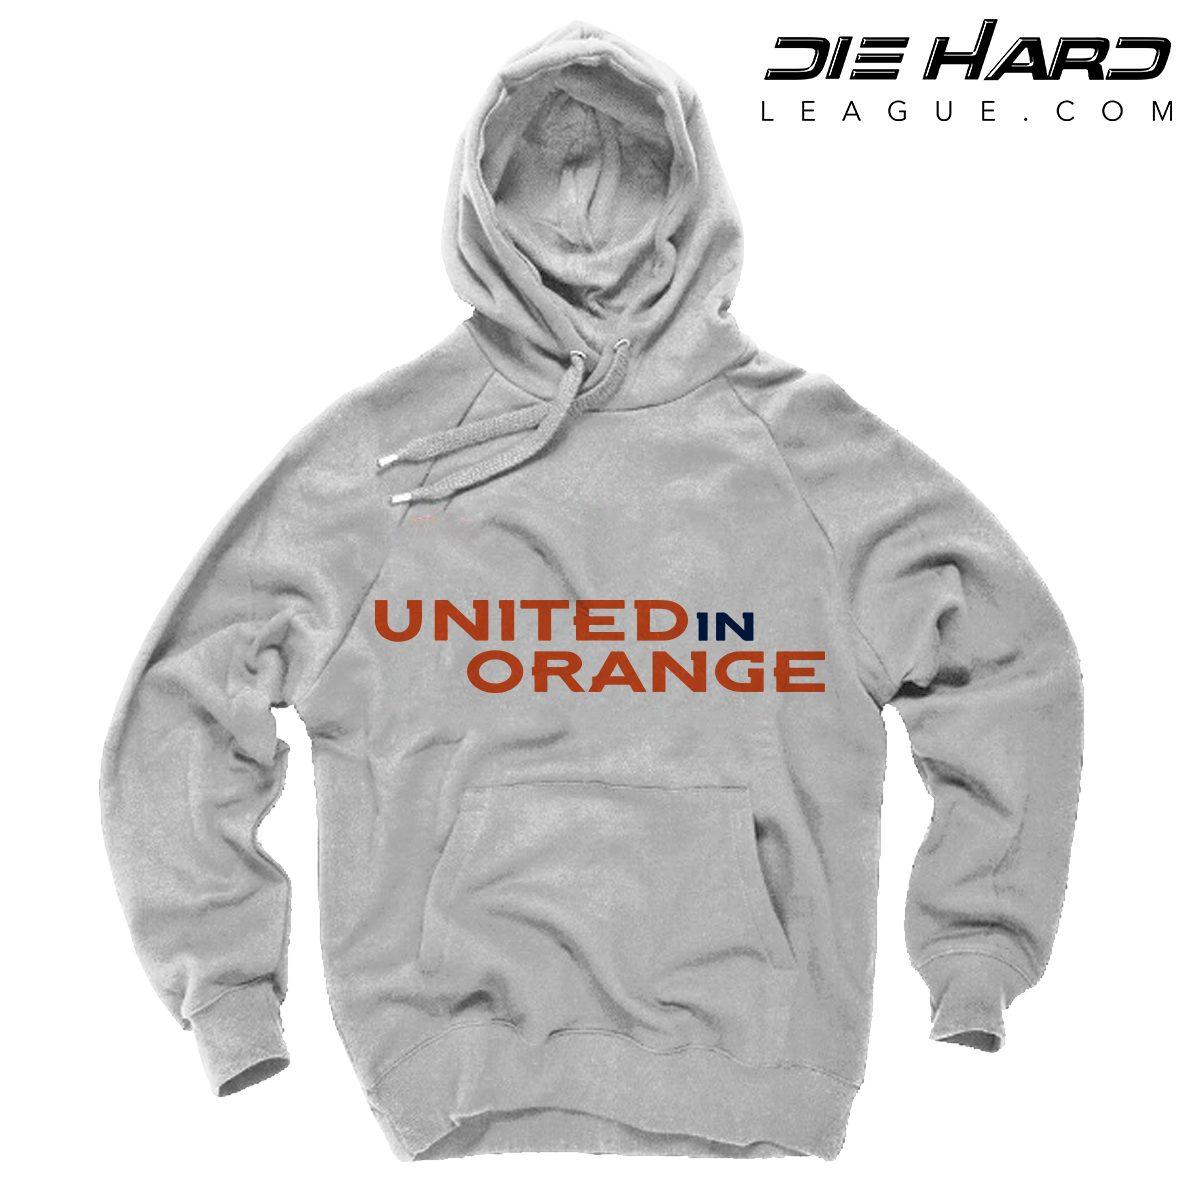 the latest 0cbdc 15ac0 Broncos Hoodie Denver - United in Orange White Sweater